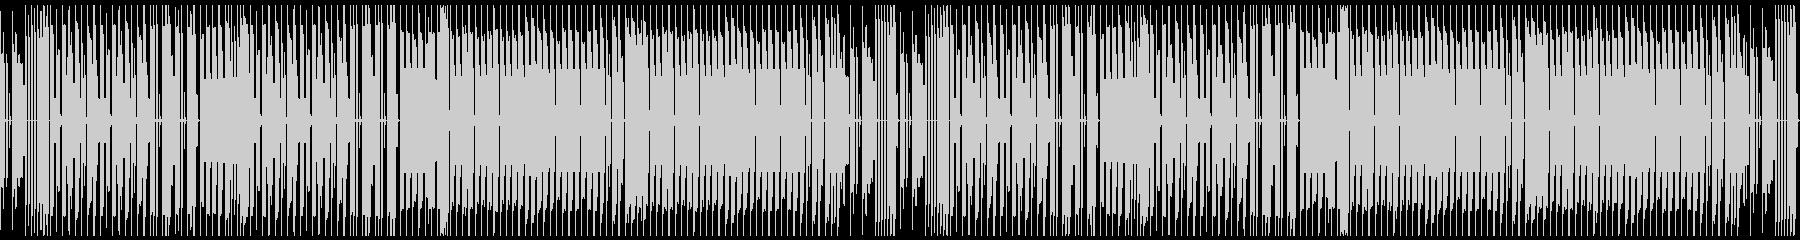 FC風ループ スーパーキノコランドの未再生の波形